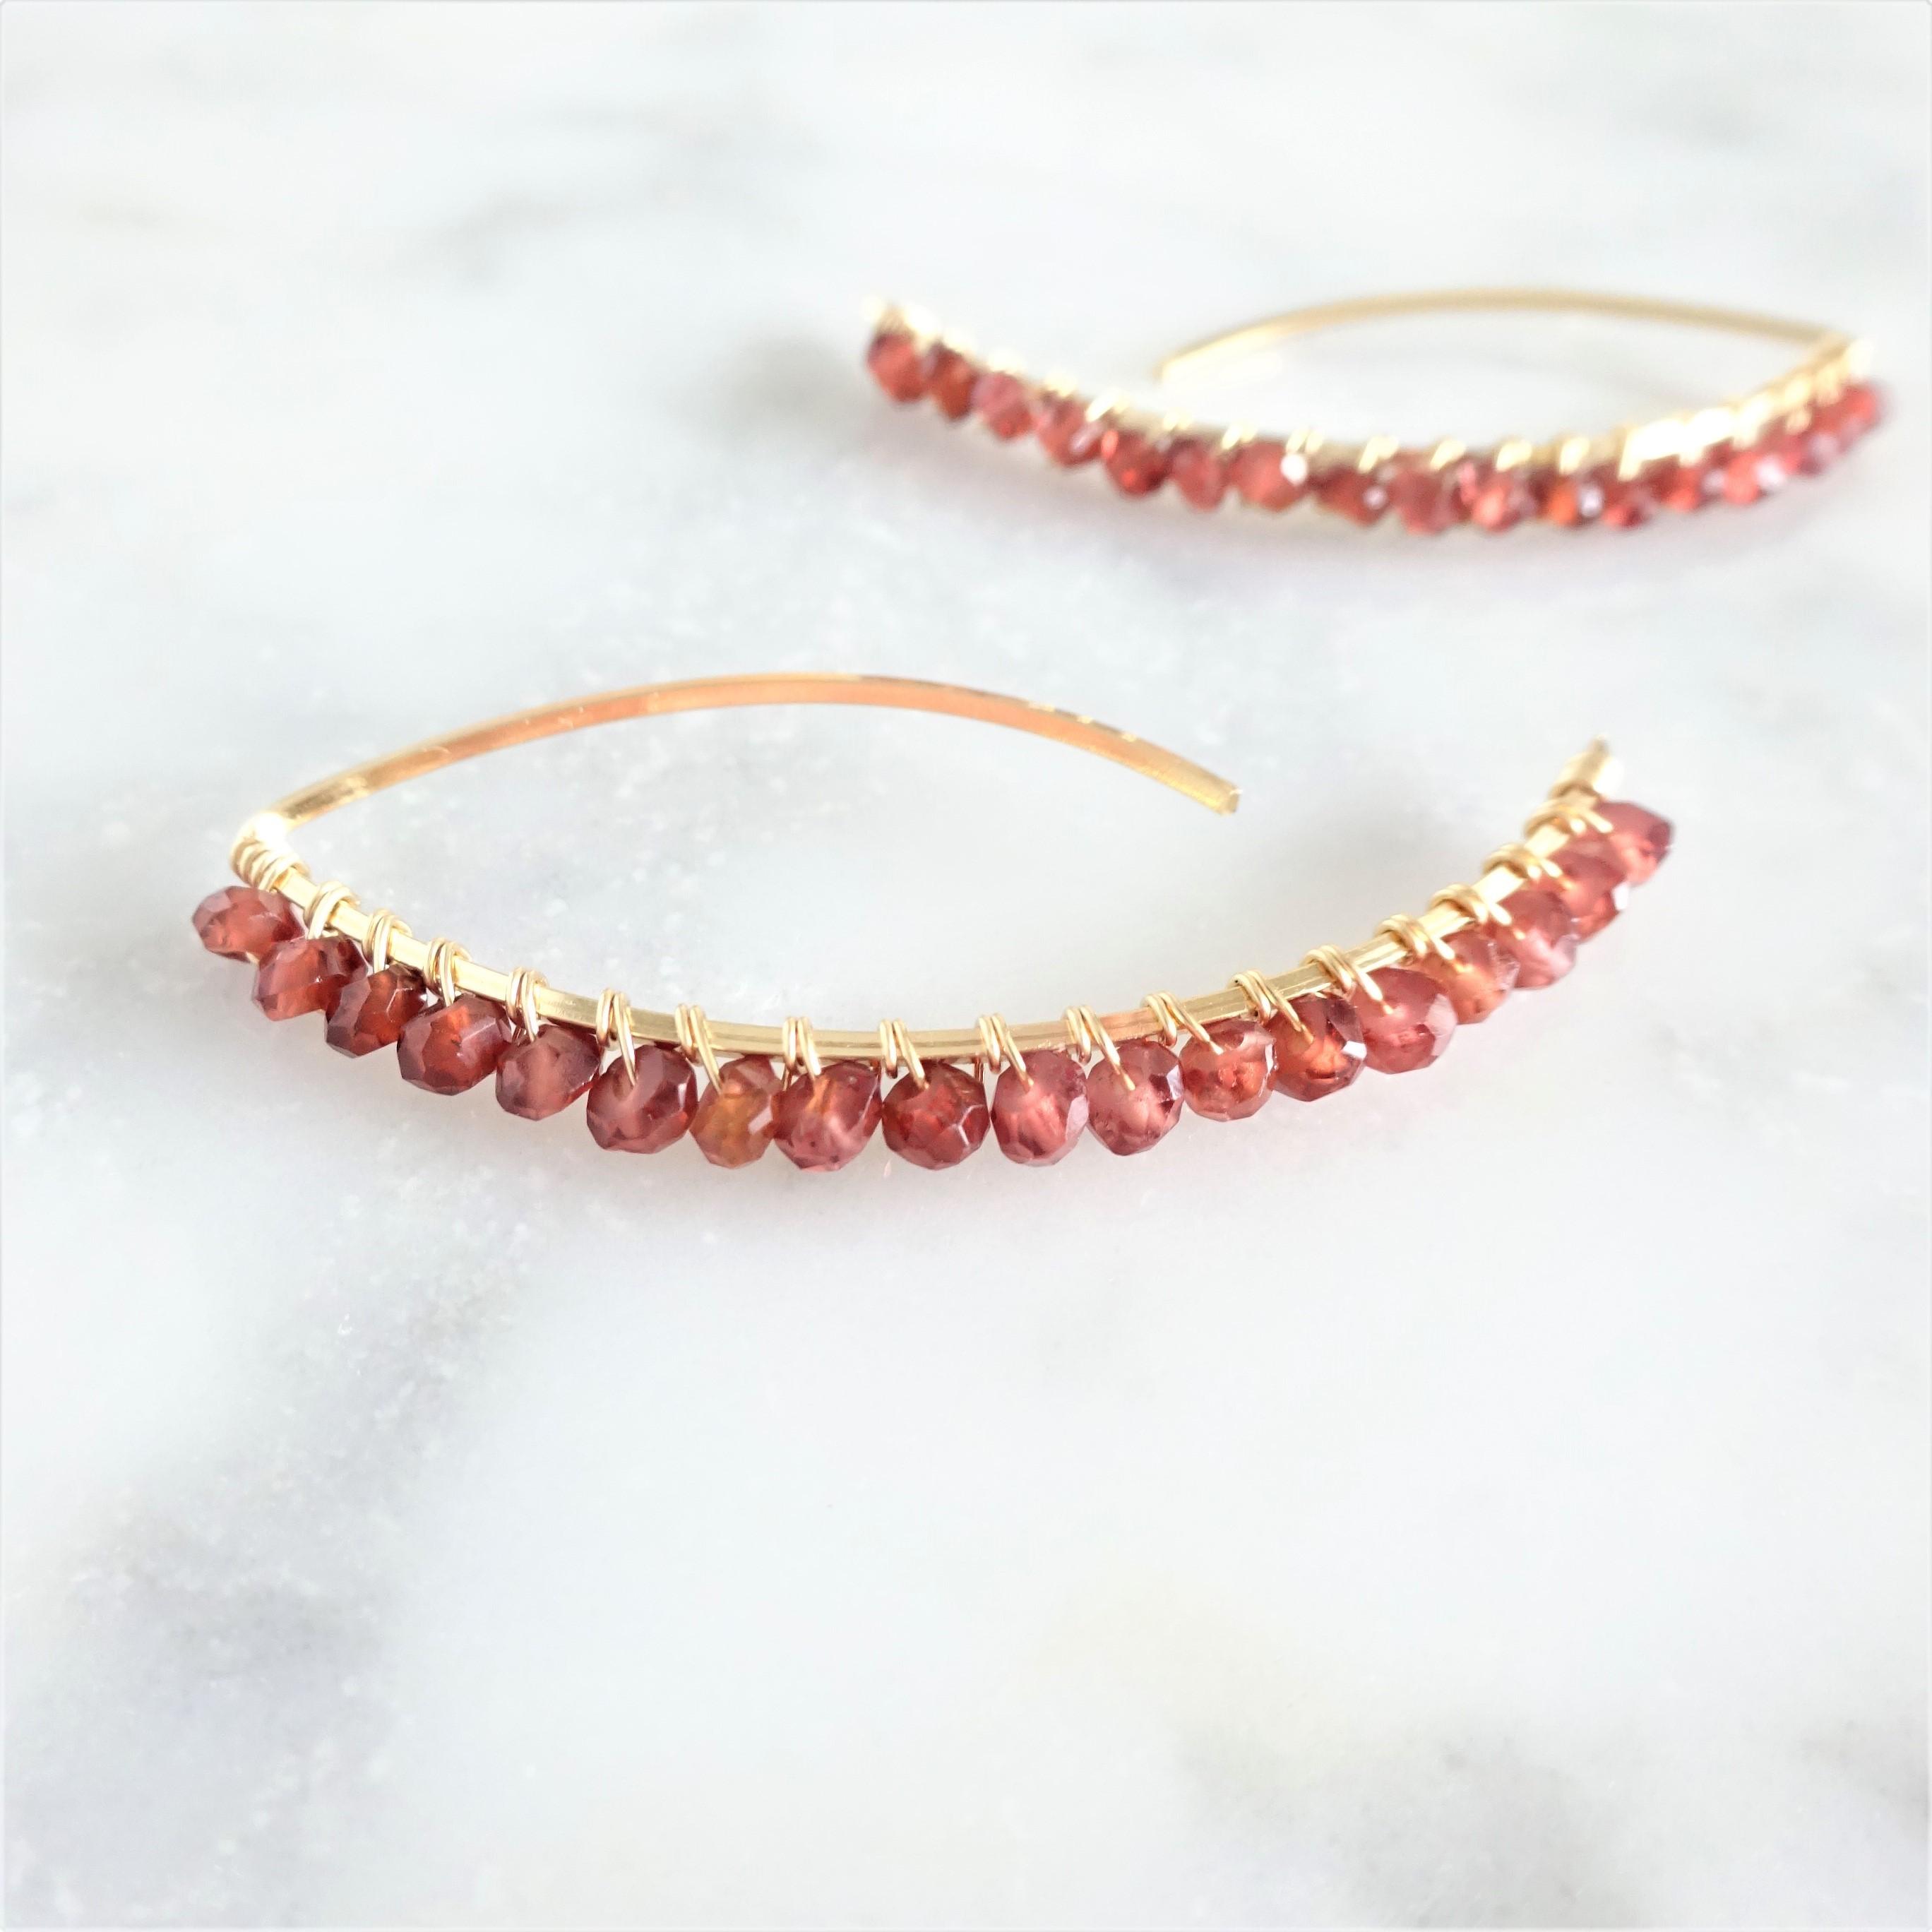 送料無料 14kgf*宝石質Garnet wrapped marquis pierced earring